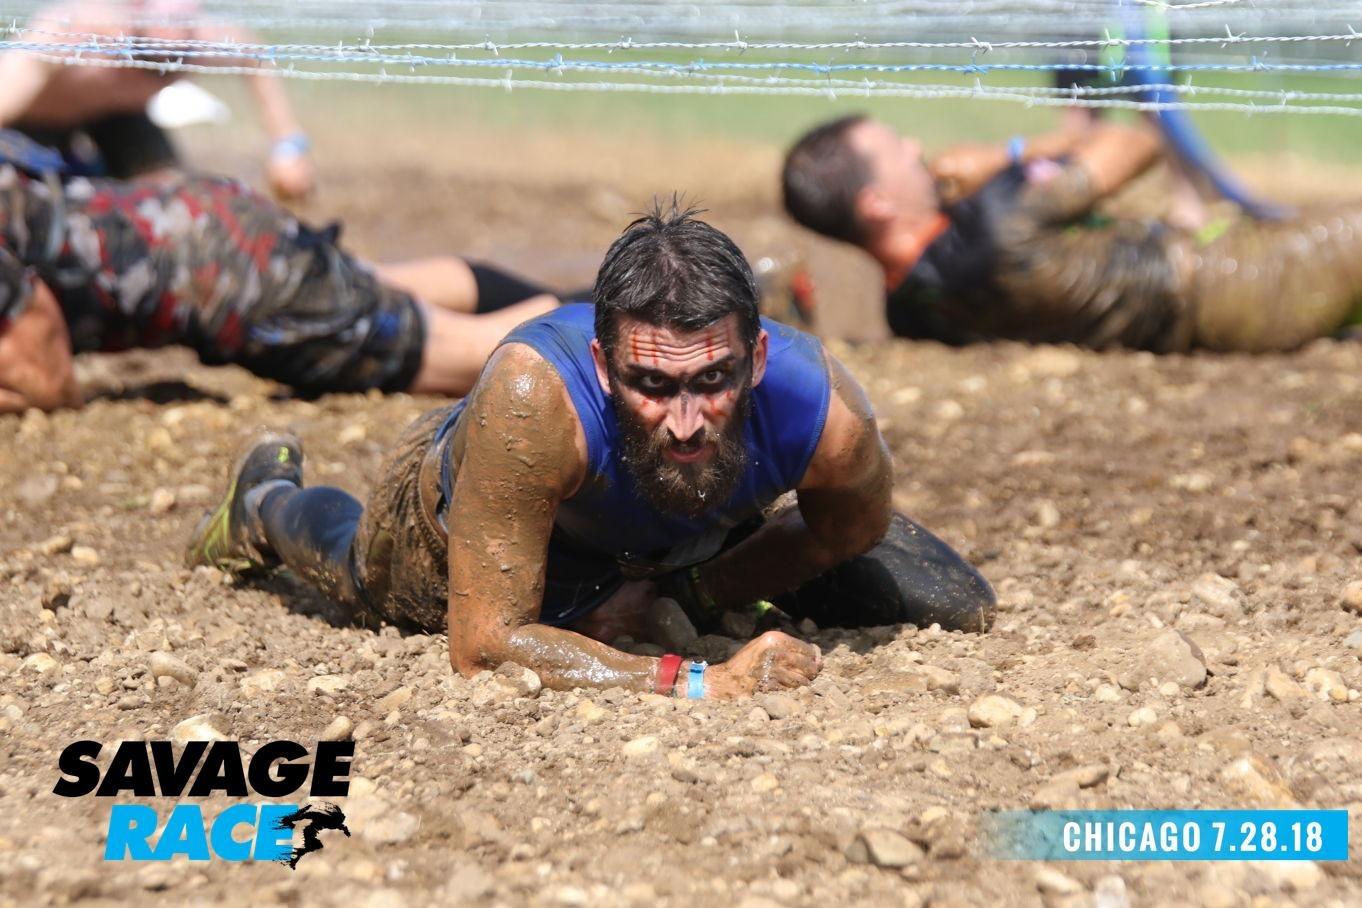 Savage_Race_Chicago_2018_Barbwire_Justin